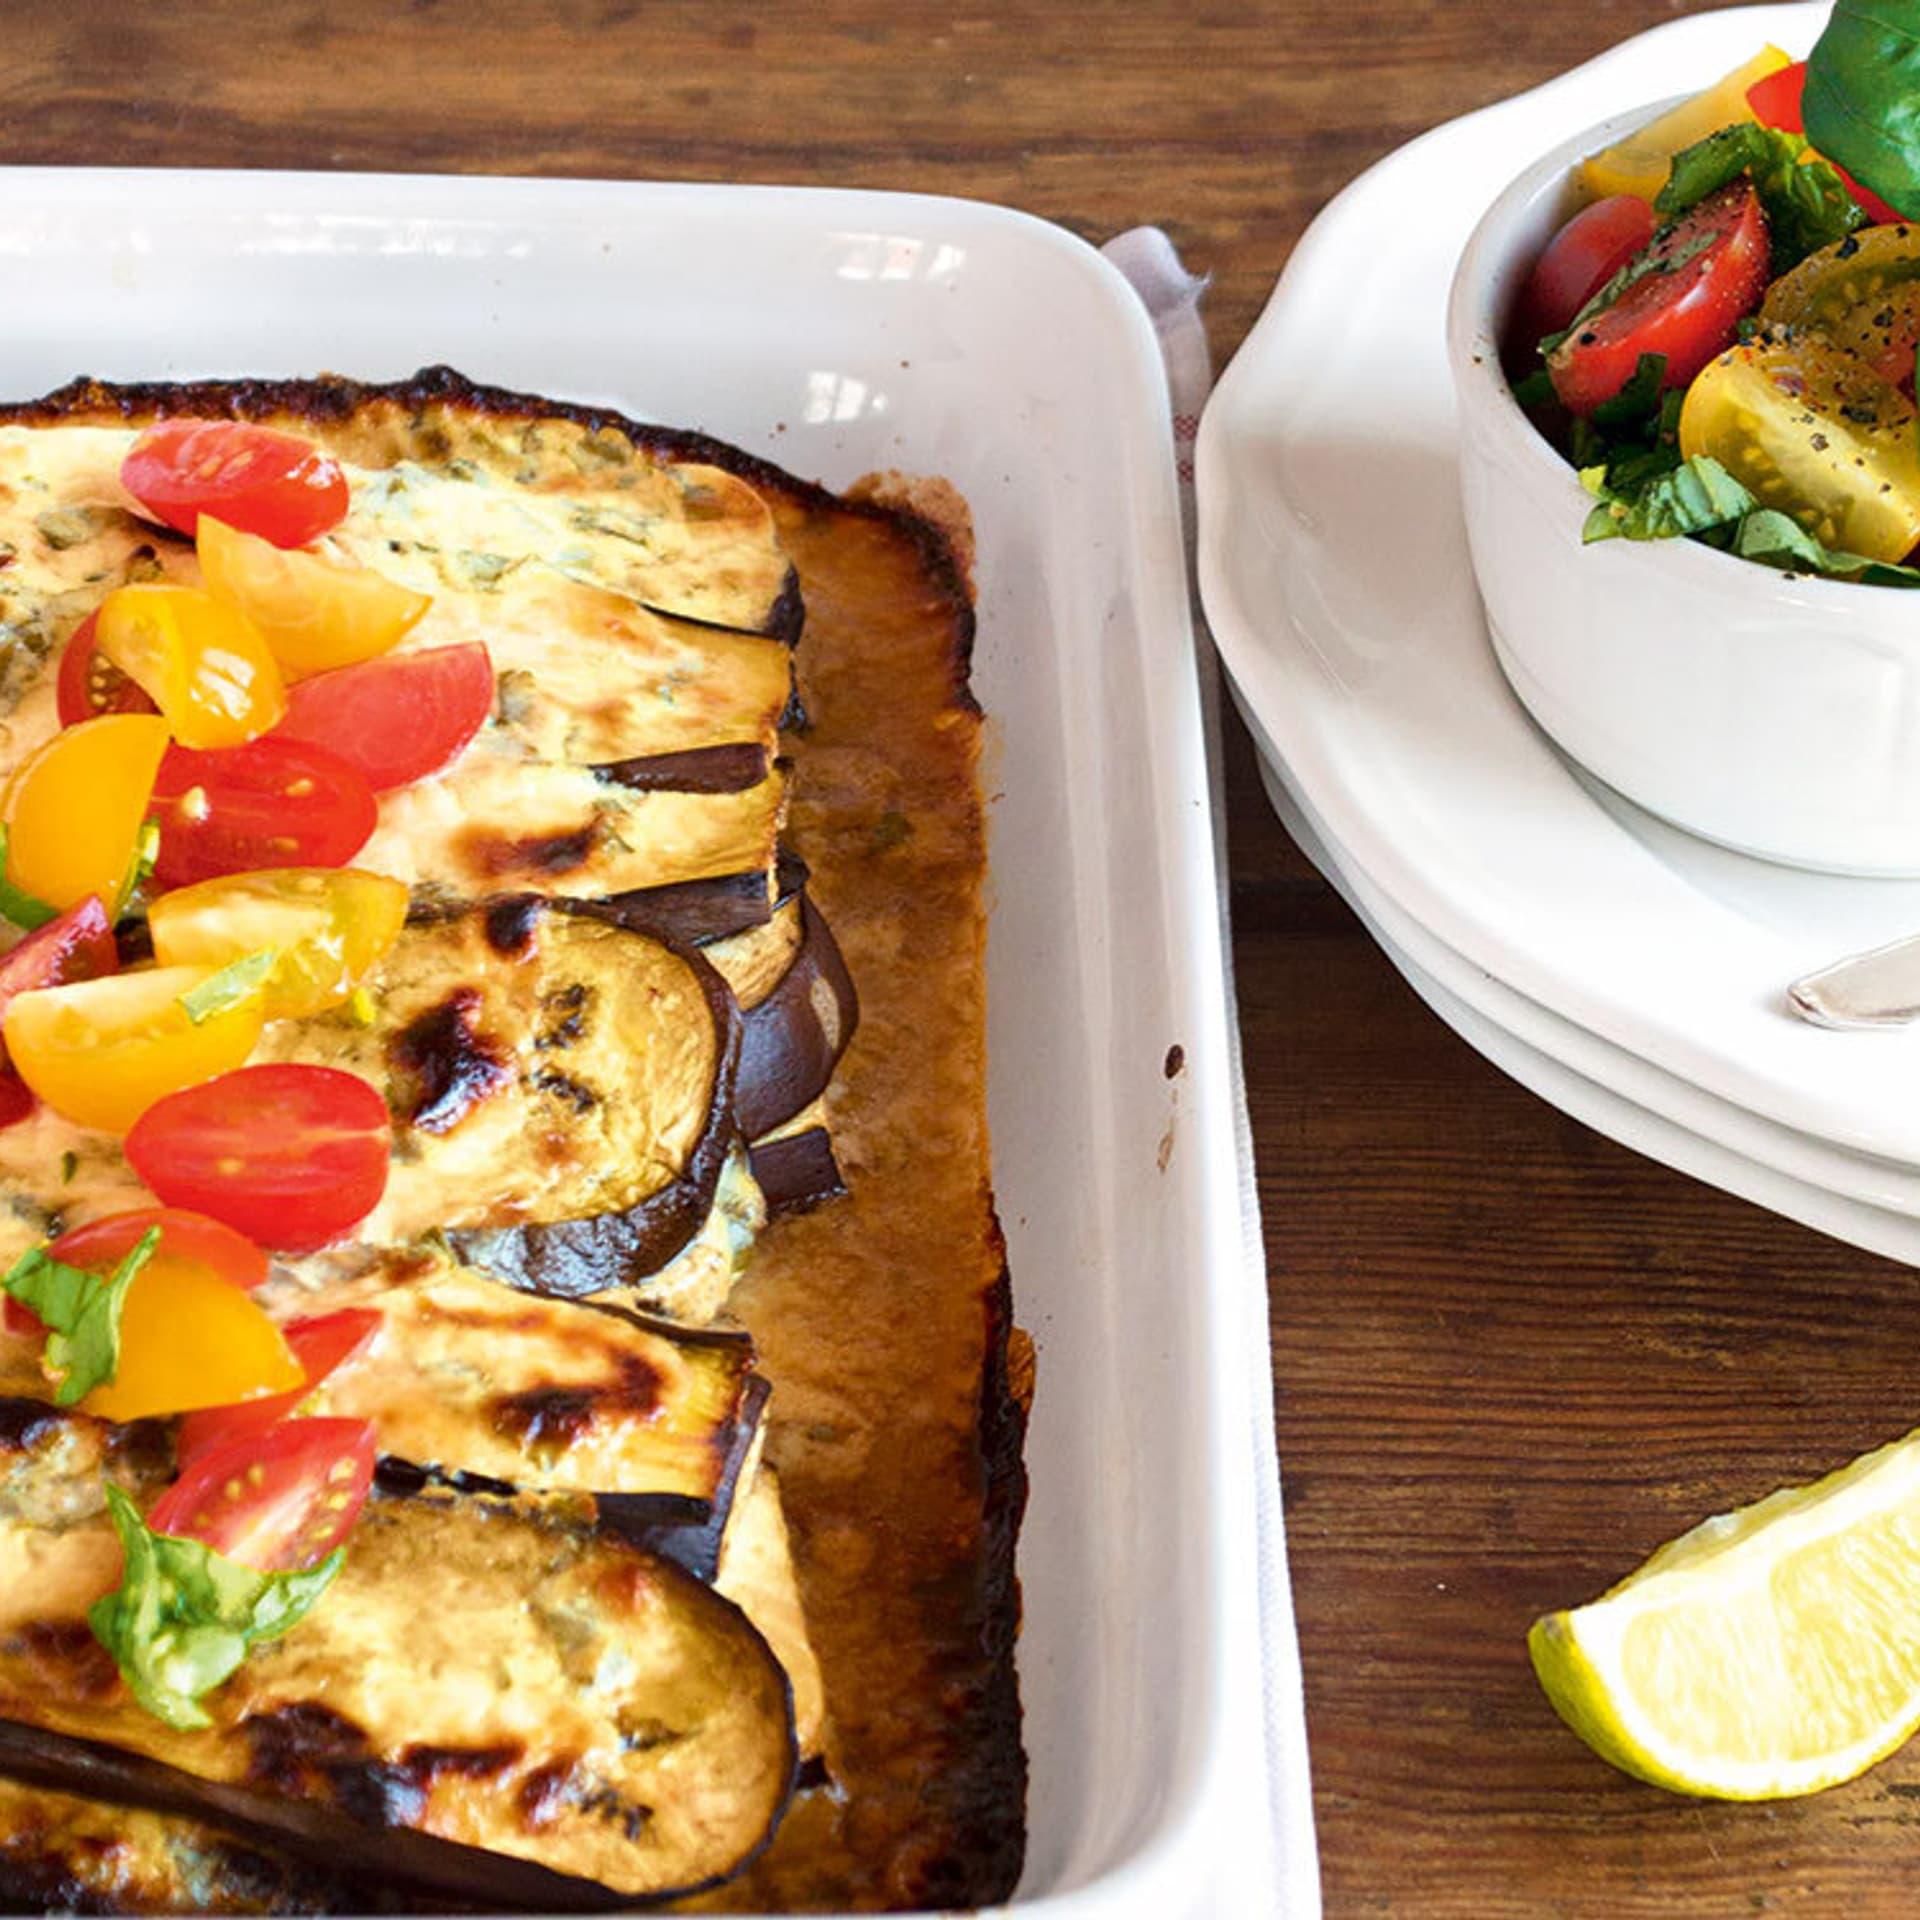 Auberginen-Parmesan-Gratin mit Tomatensalsa